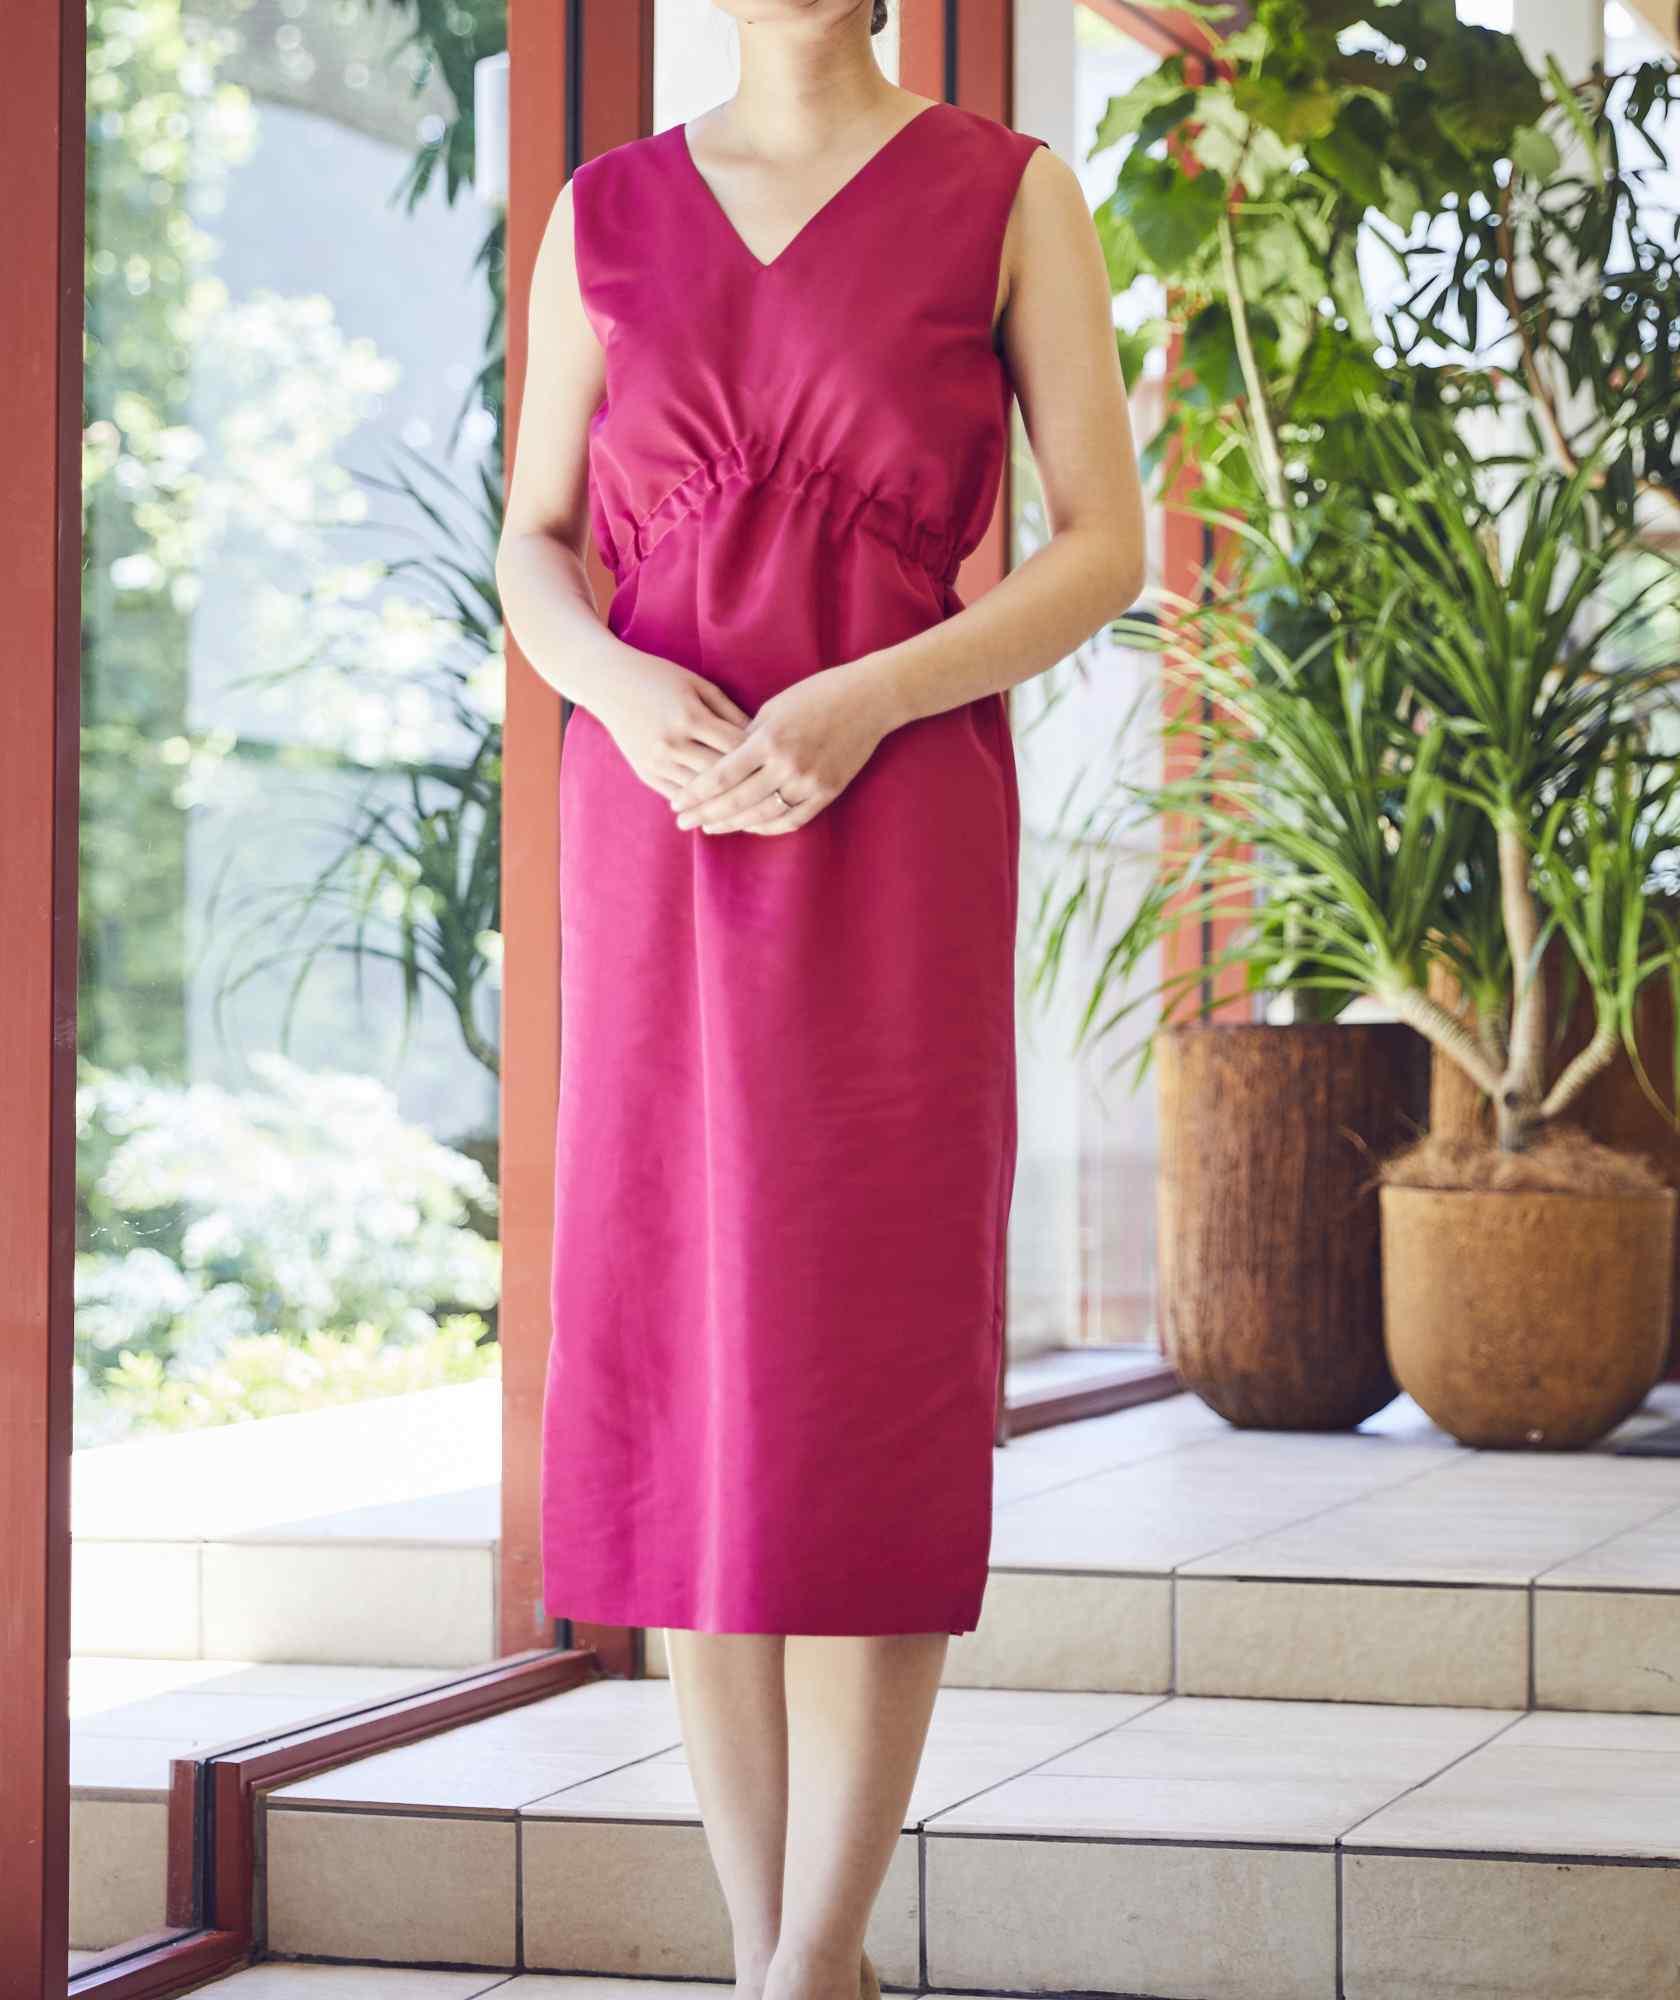 VネックシャーリングOGタイトミディアムドレス-ピンク-S